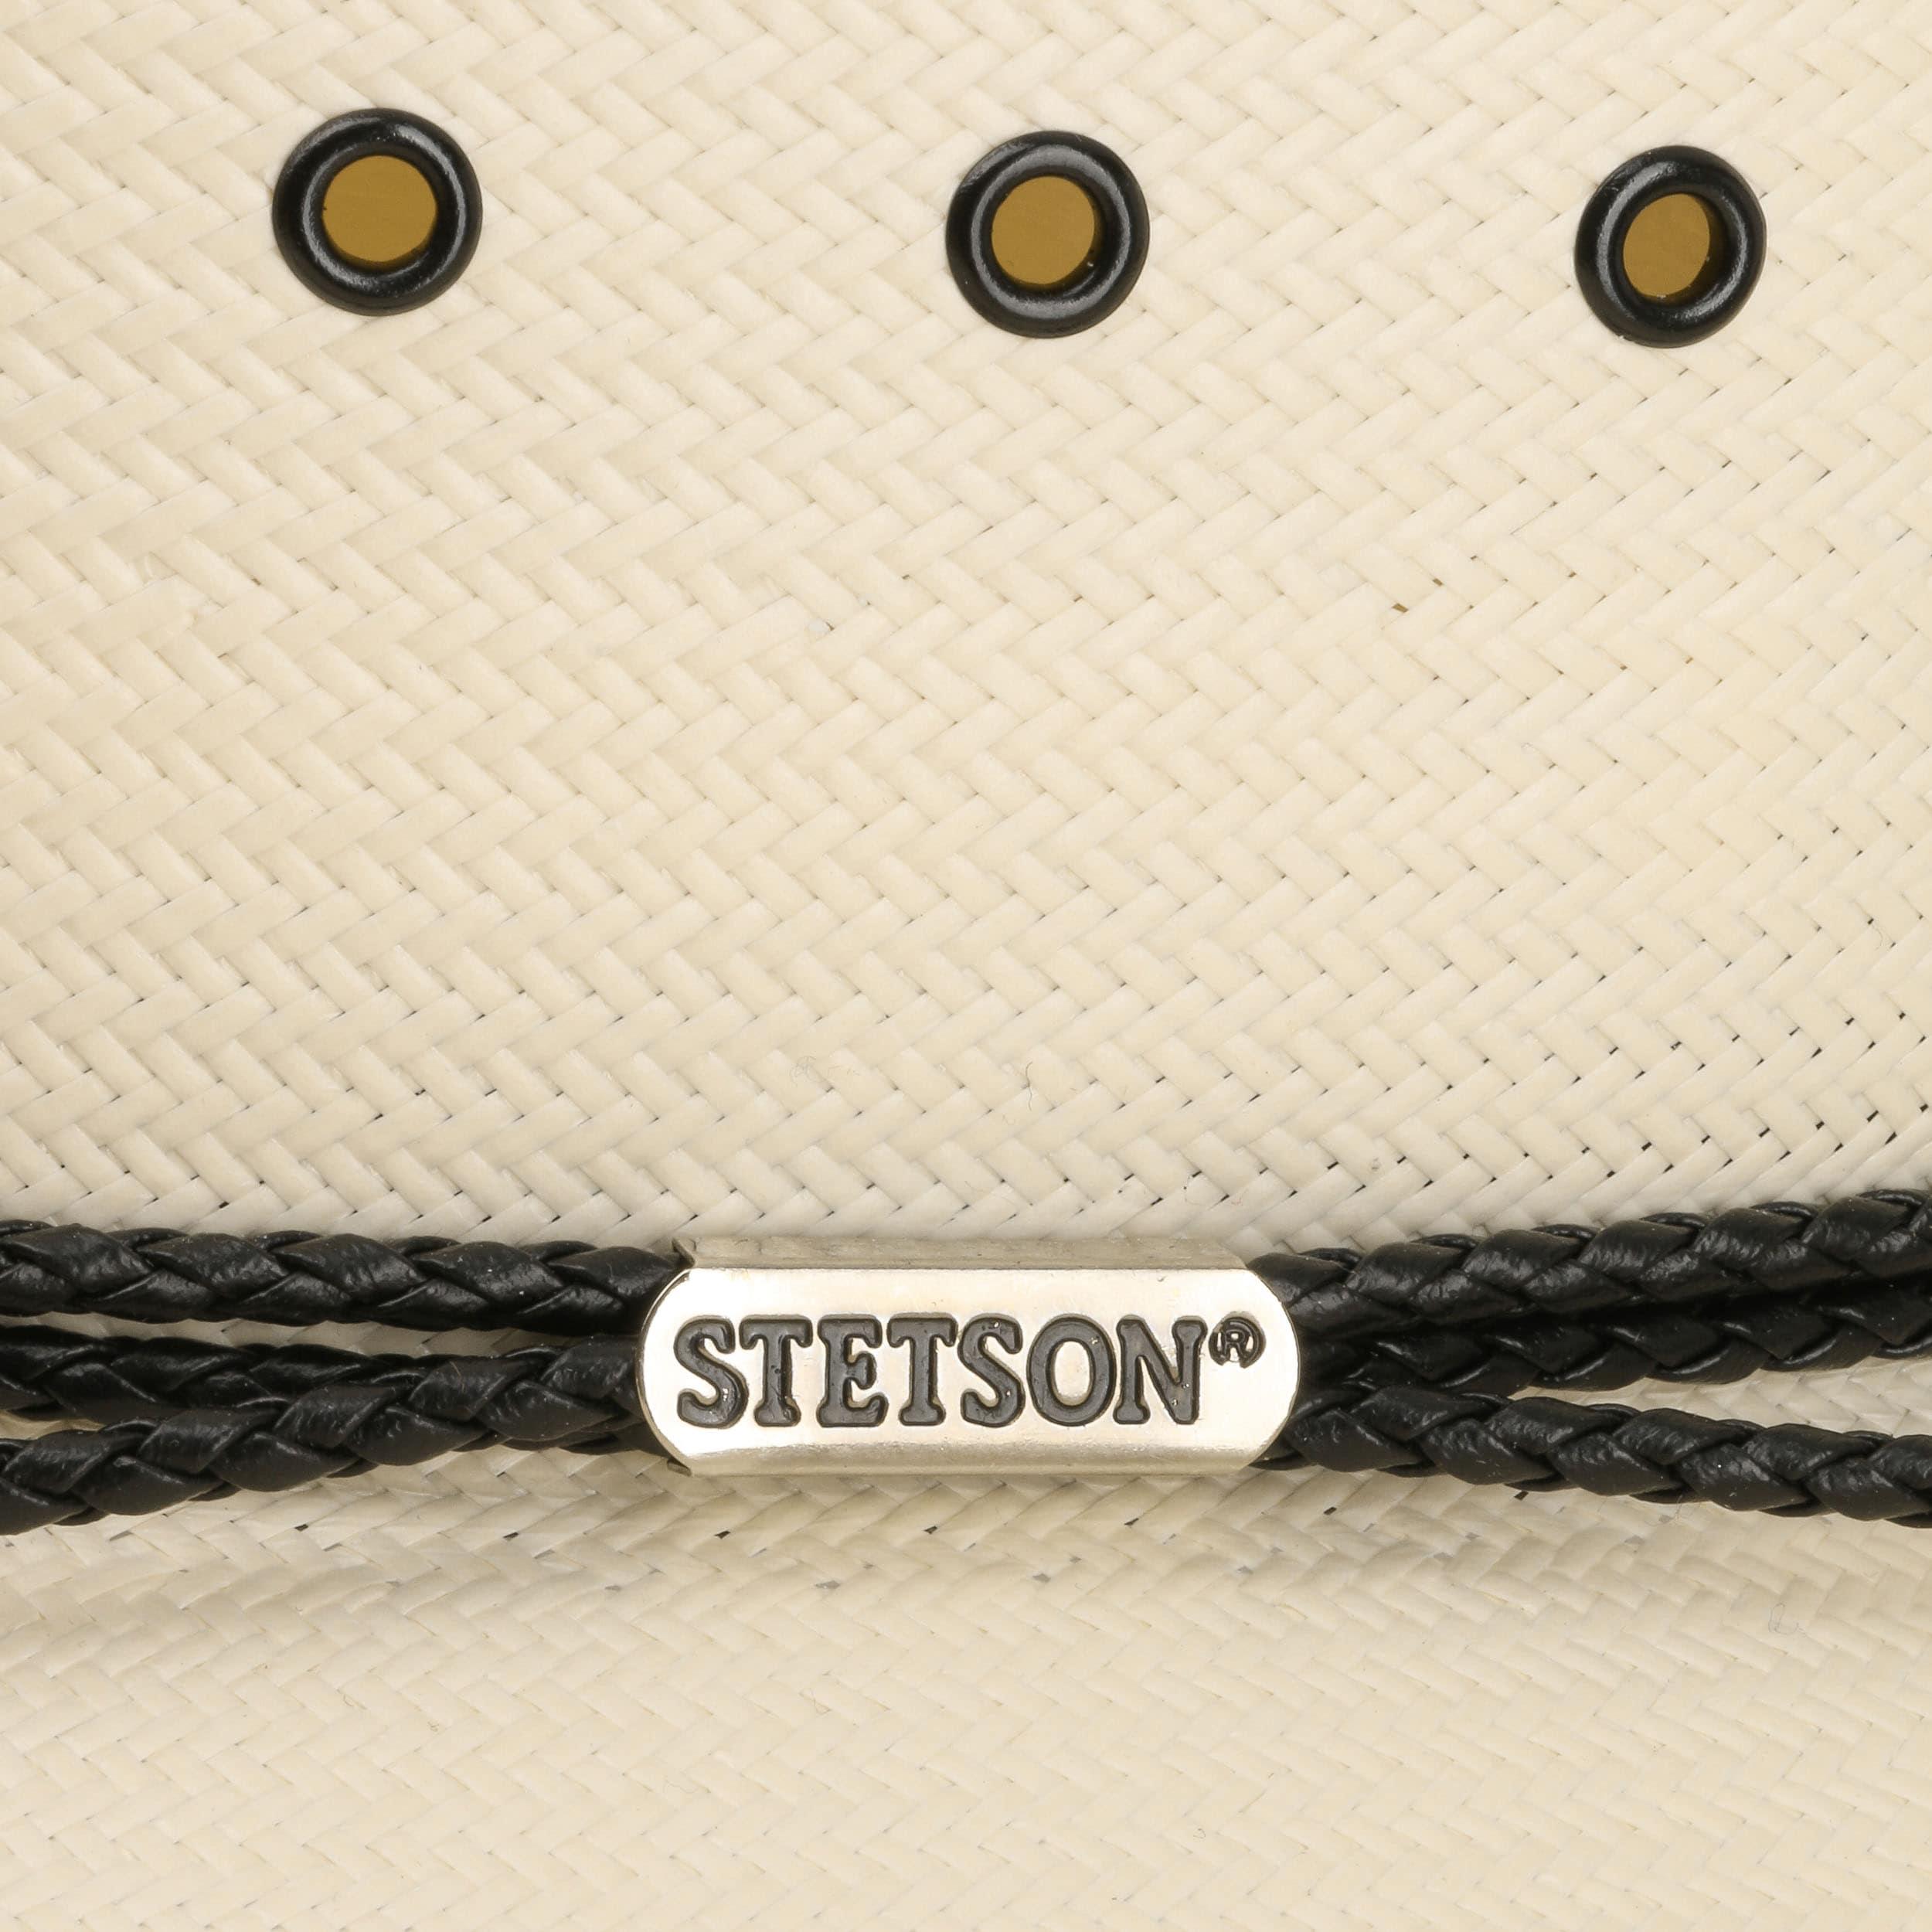 ... Sombrero de Paja Oeste Comfort 10X by Stetson - blanco crema 3 ... 193a10c4199